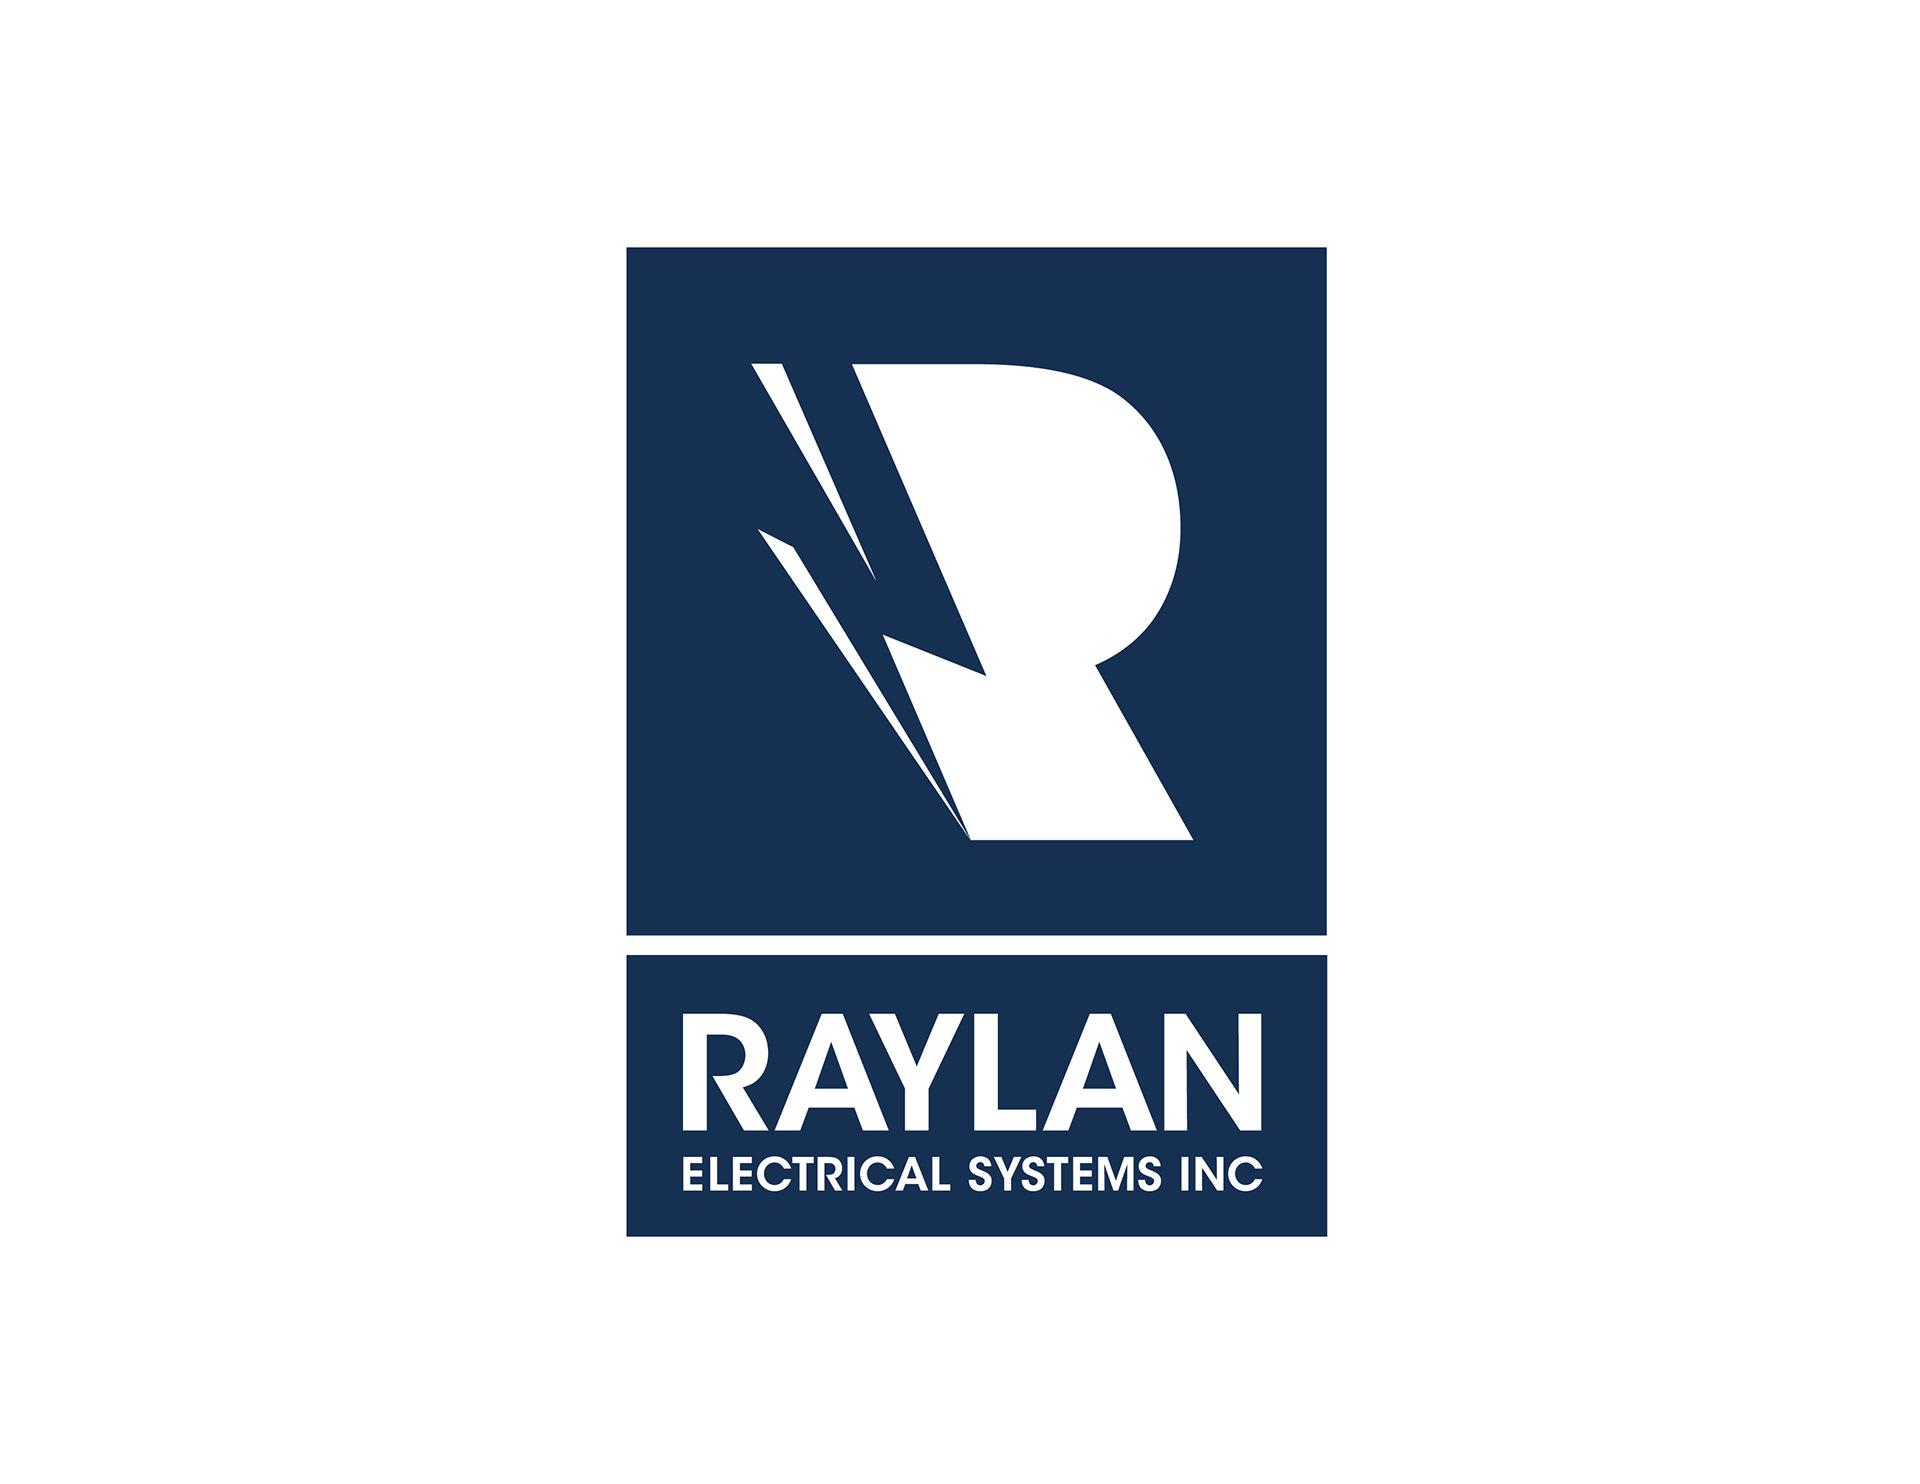 rohnny kosan - Raylan Electrical Systems - Brand Identity